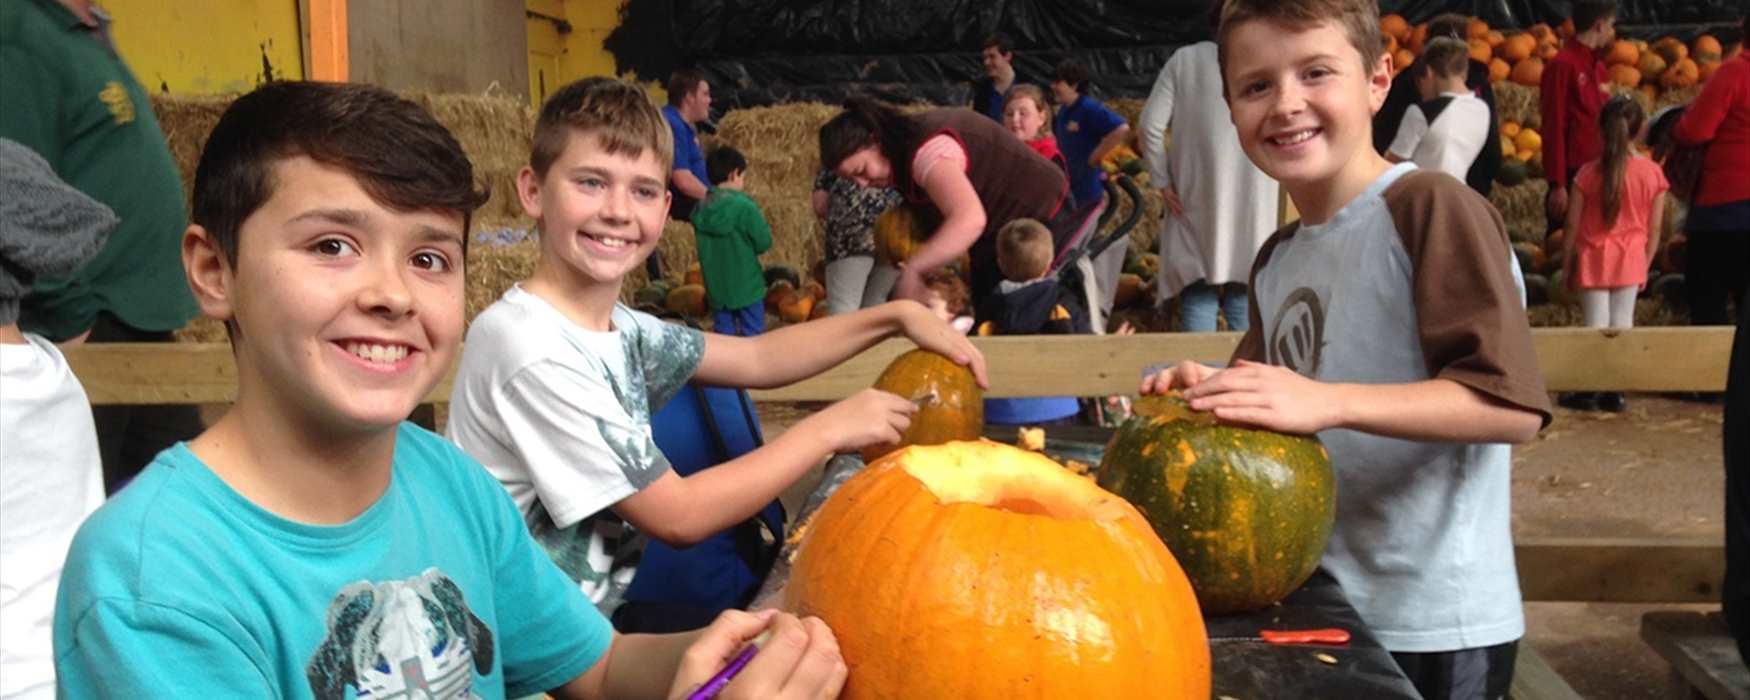 Halloween activities at Crealy